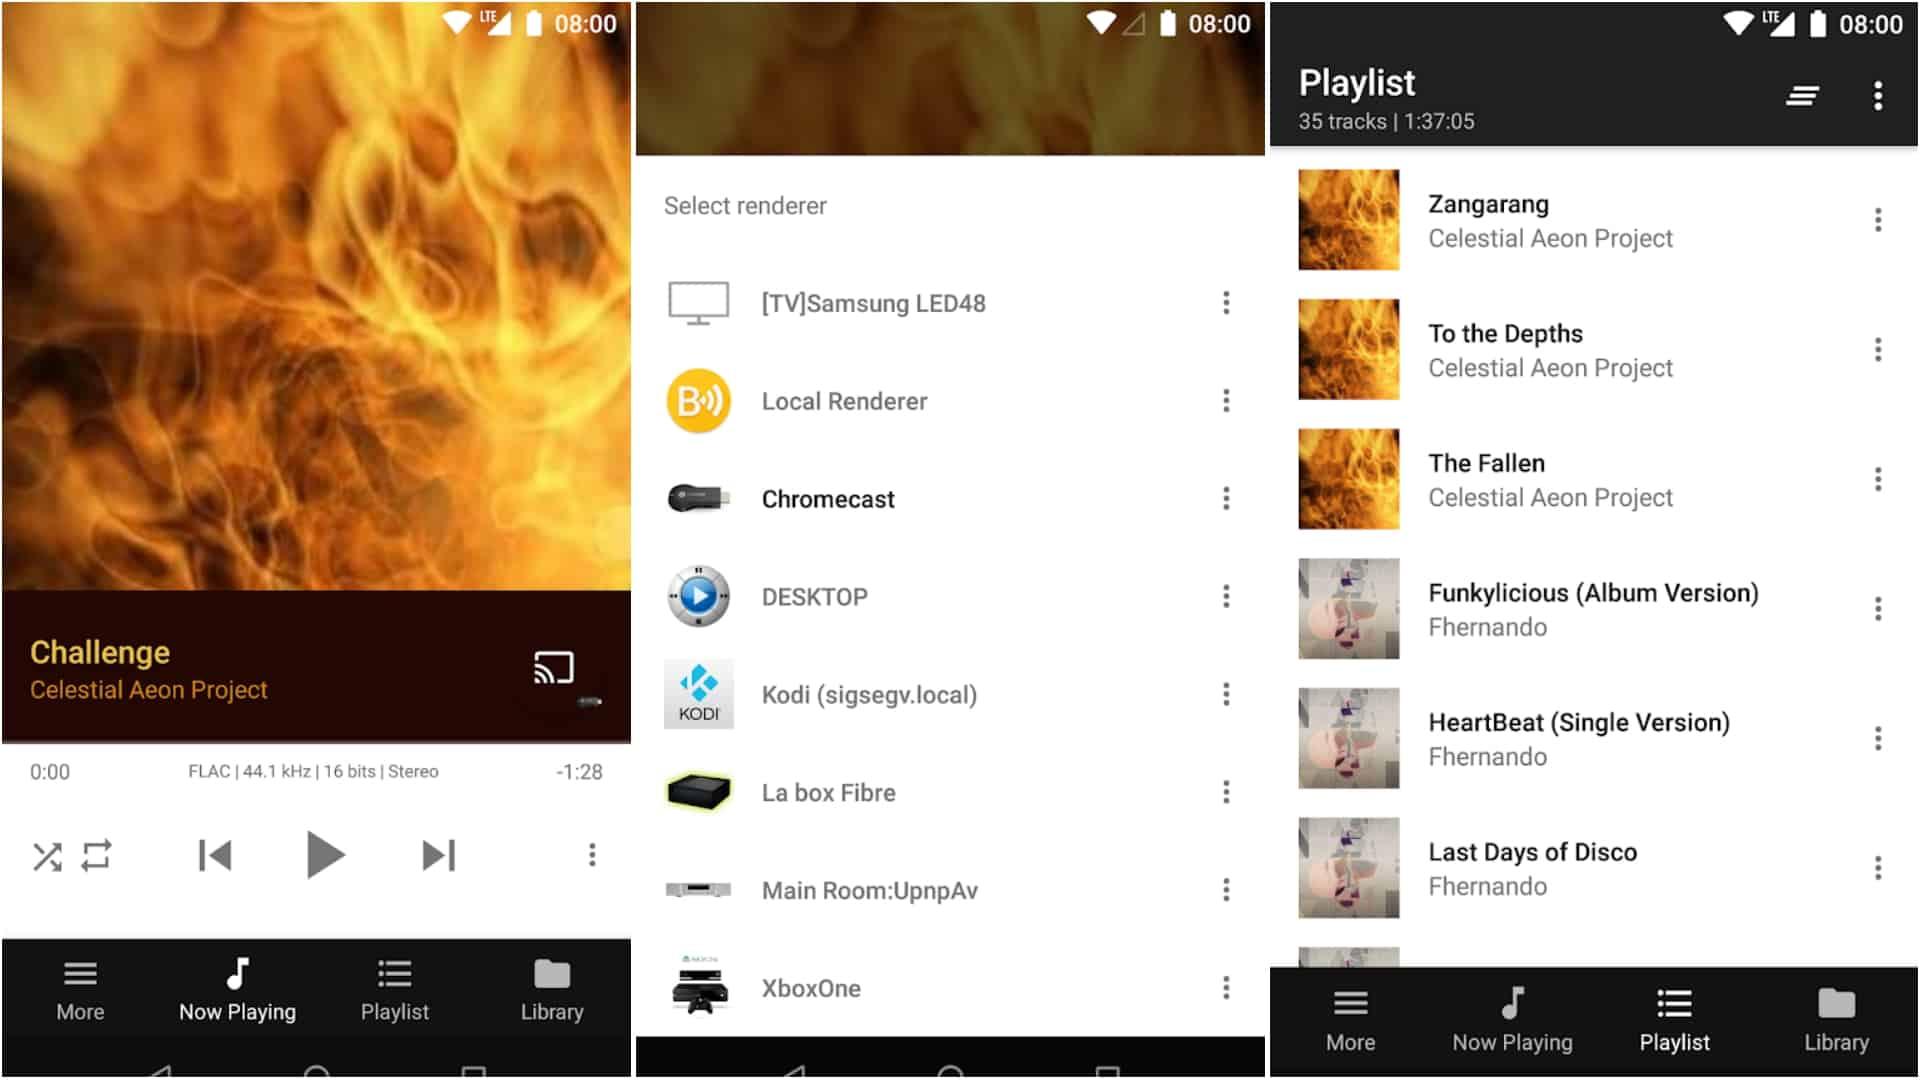 BubbleUPnP app grid image